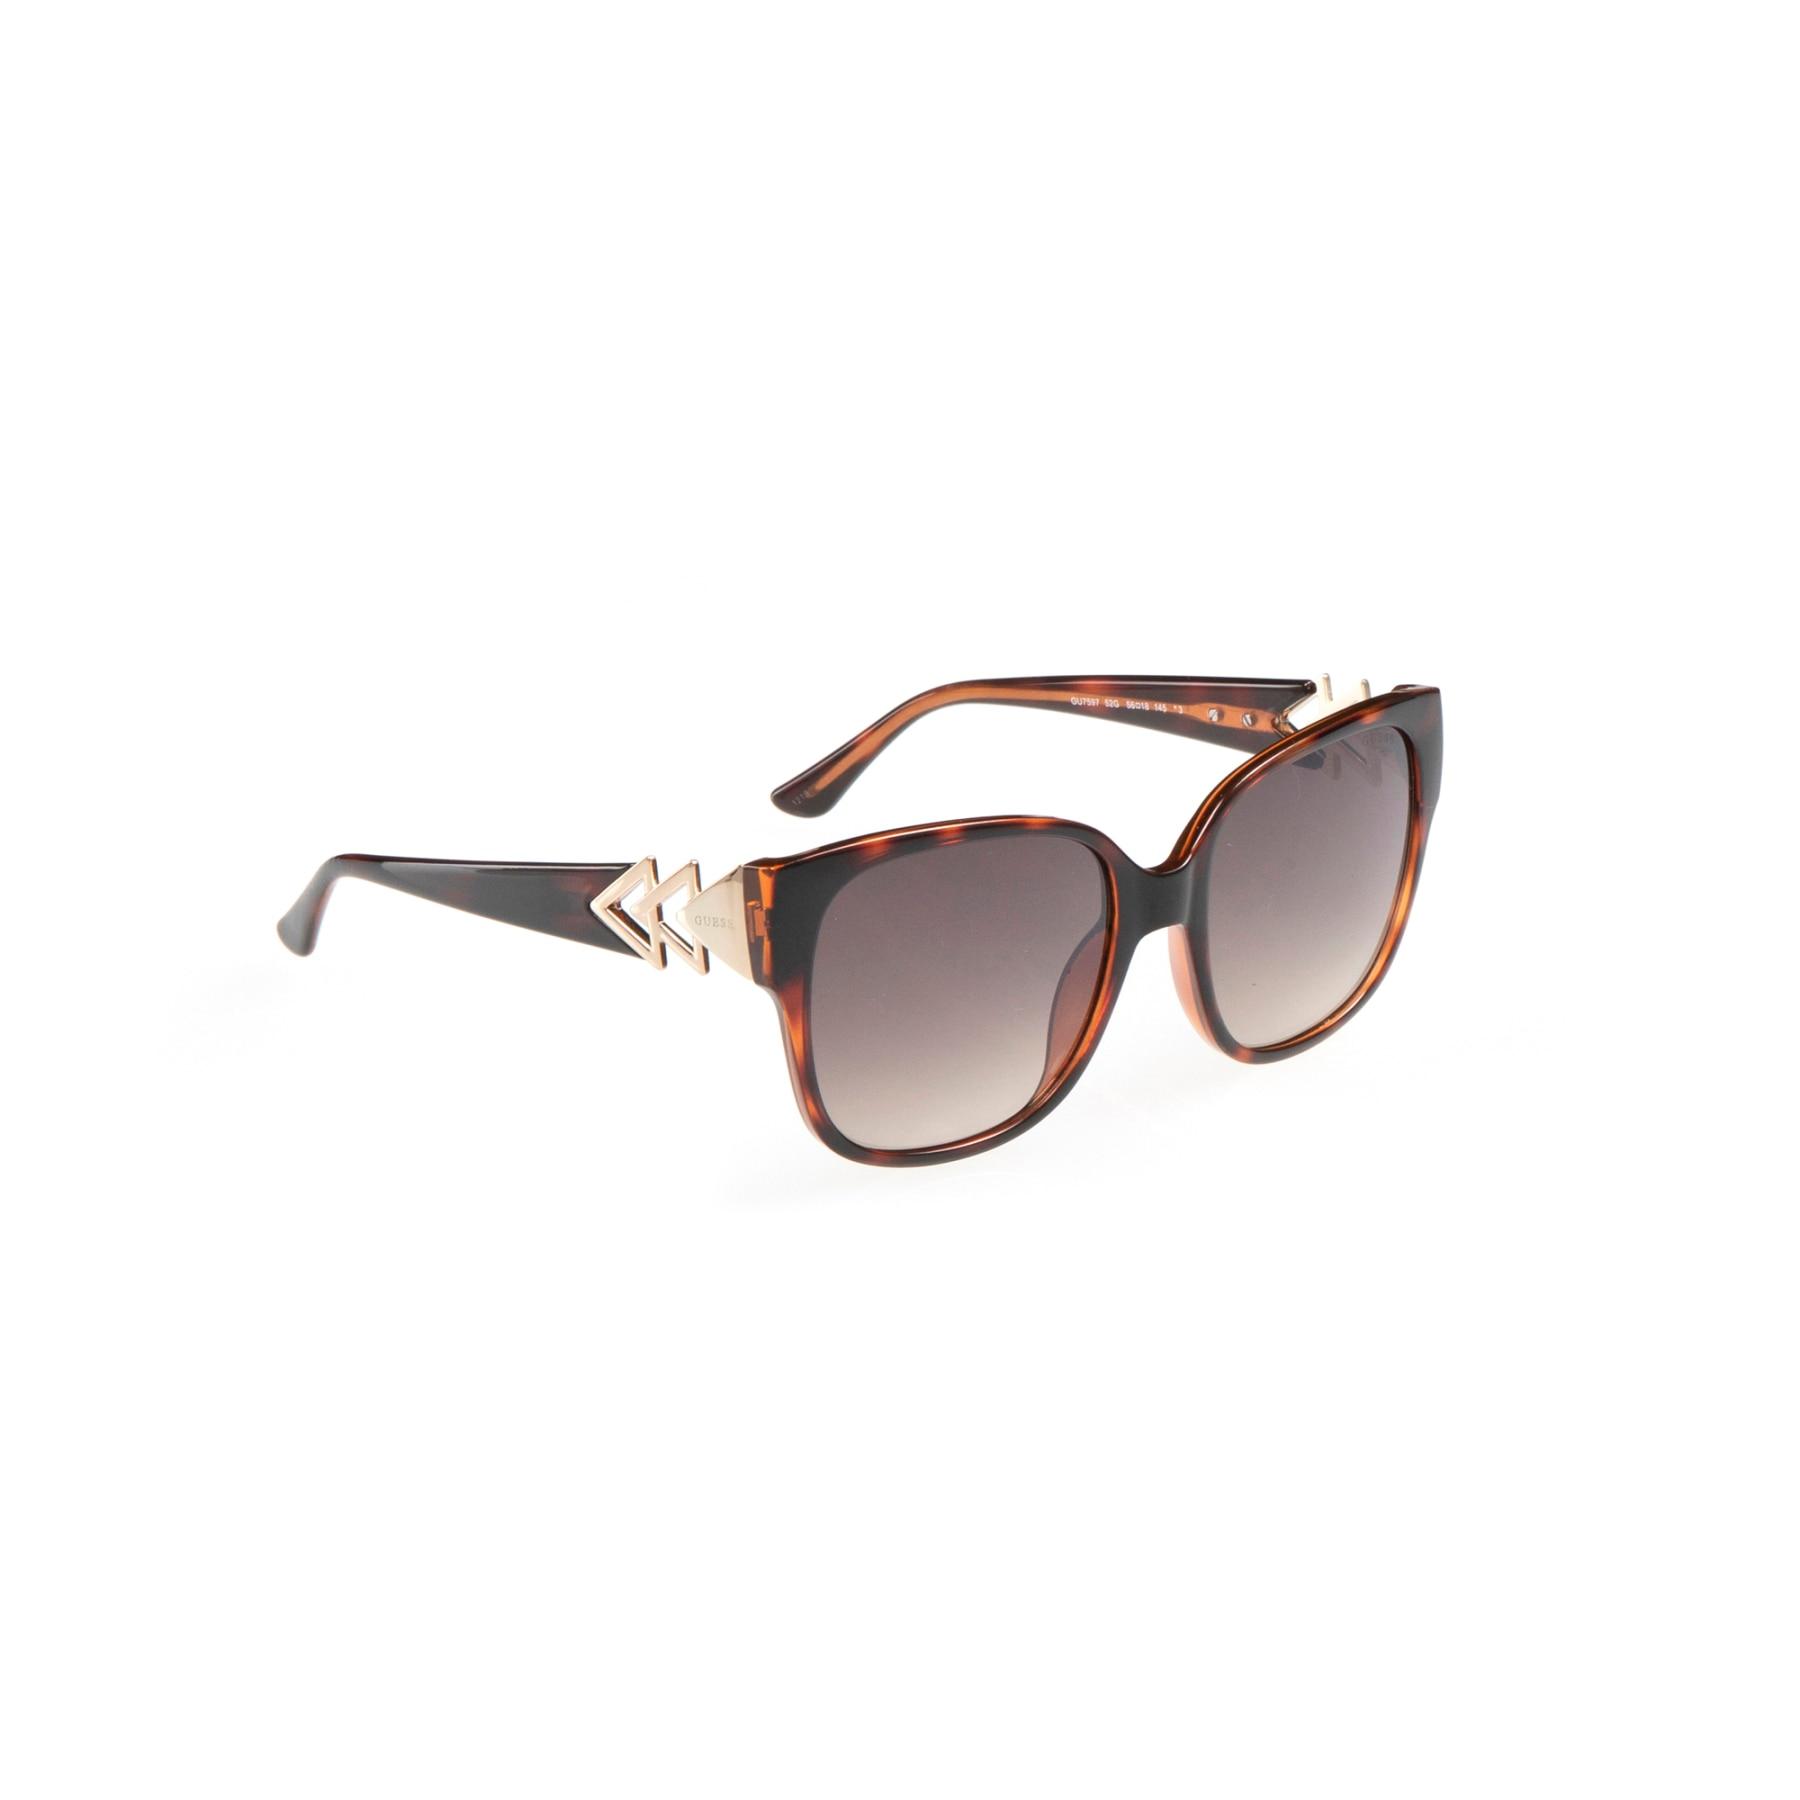 Women's sunglasses gu 7597 52g bone Brown organic square square 56-18-145 guess